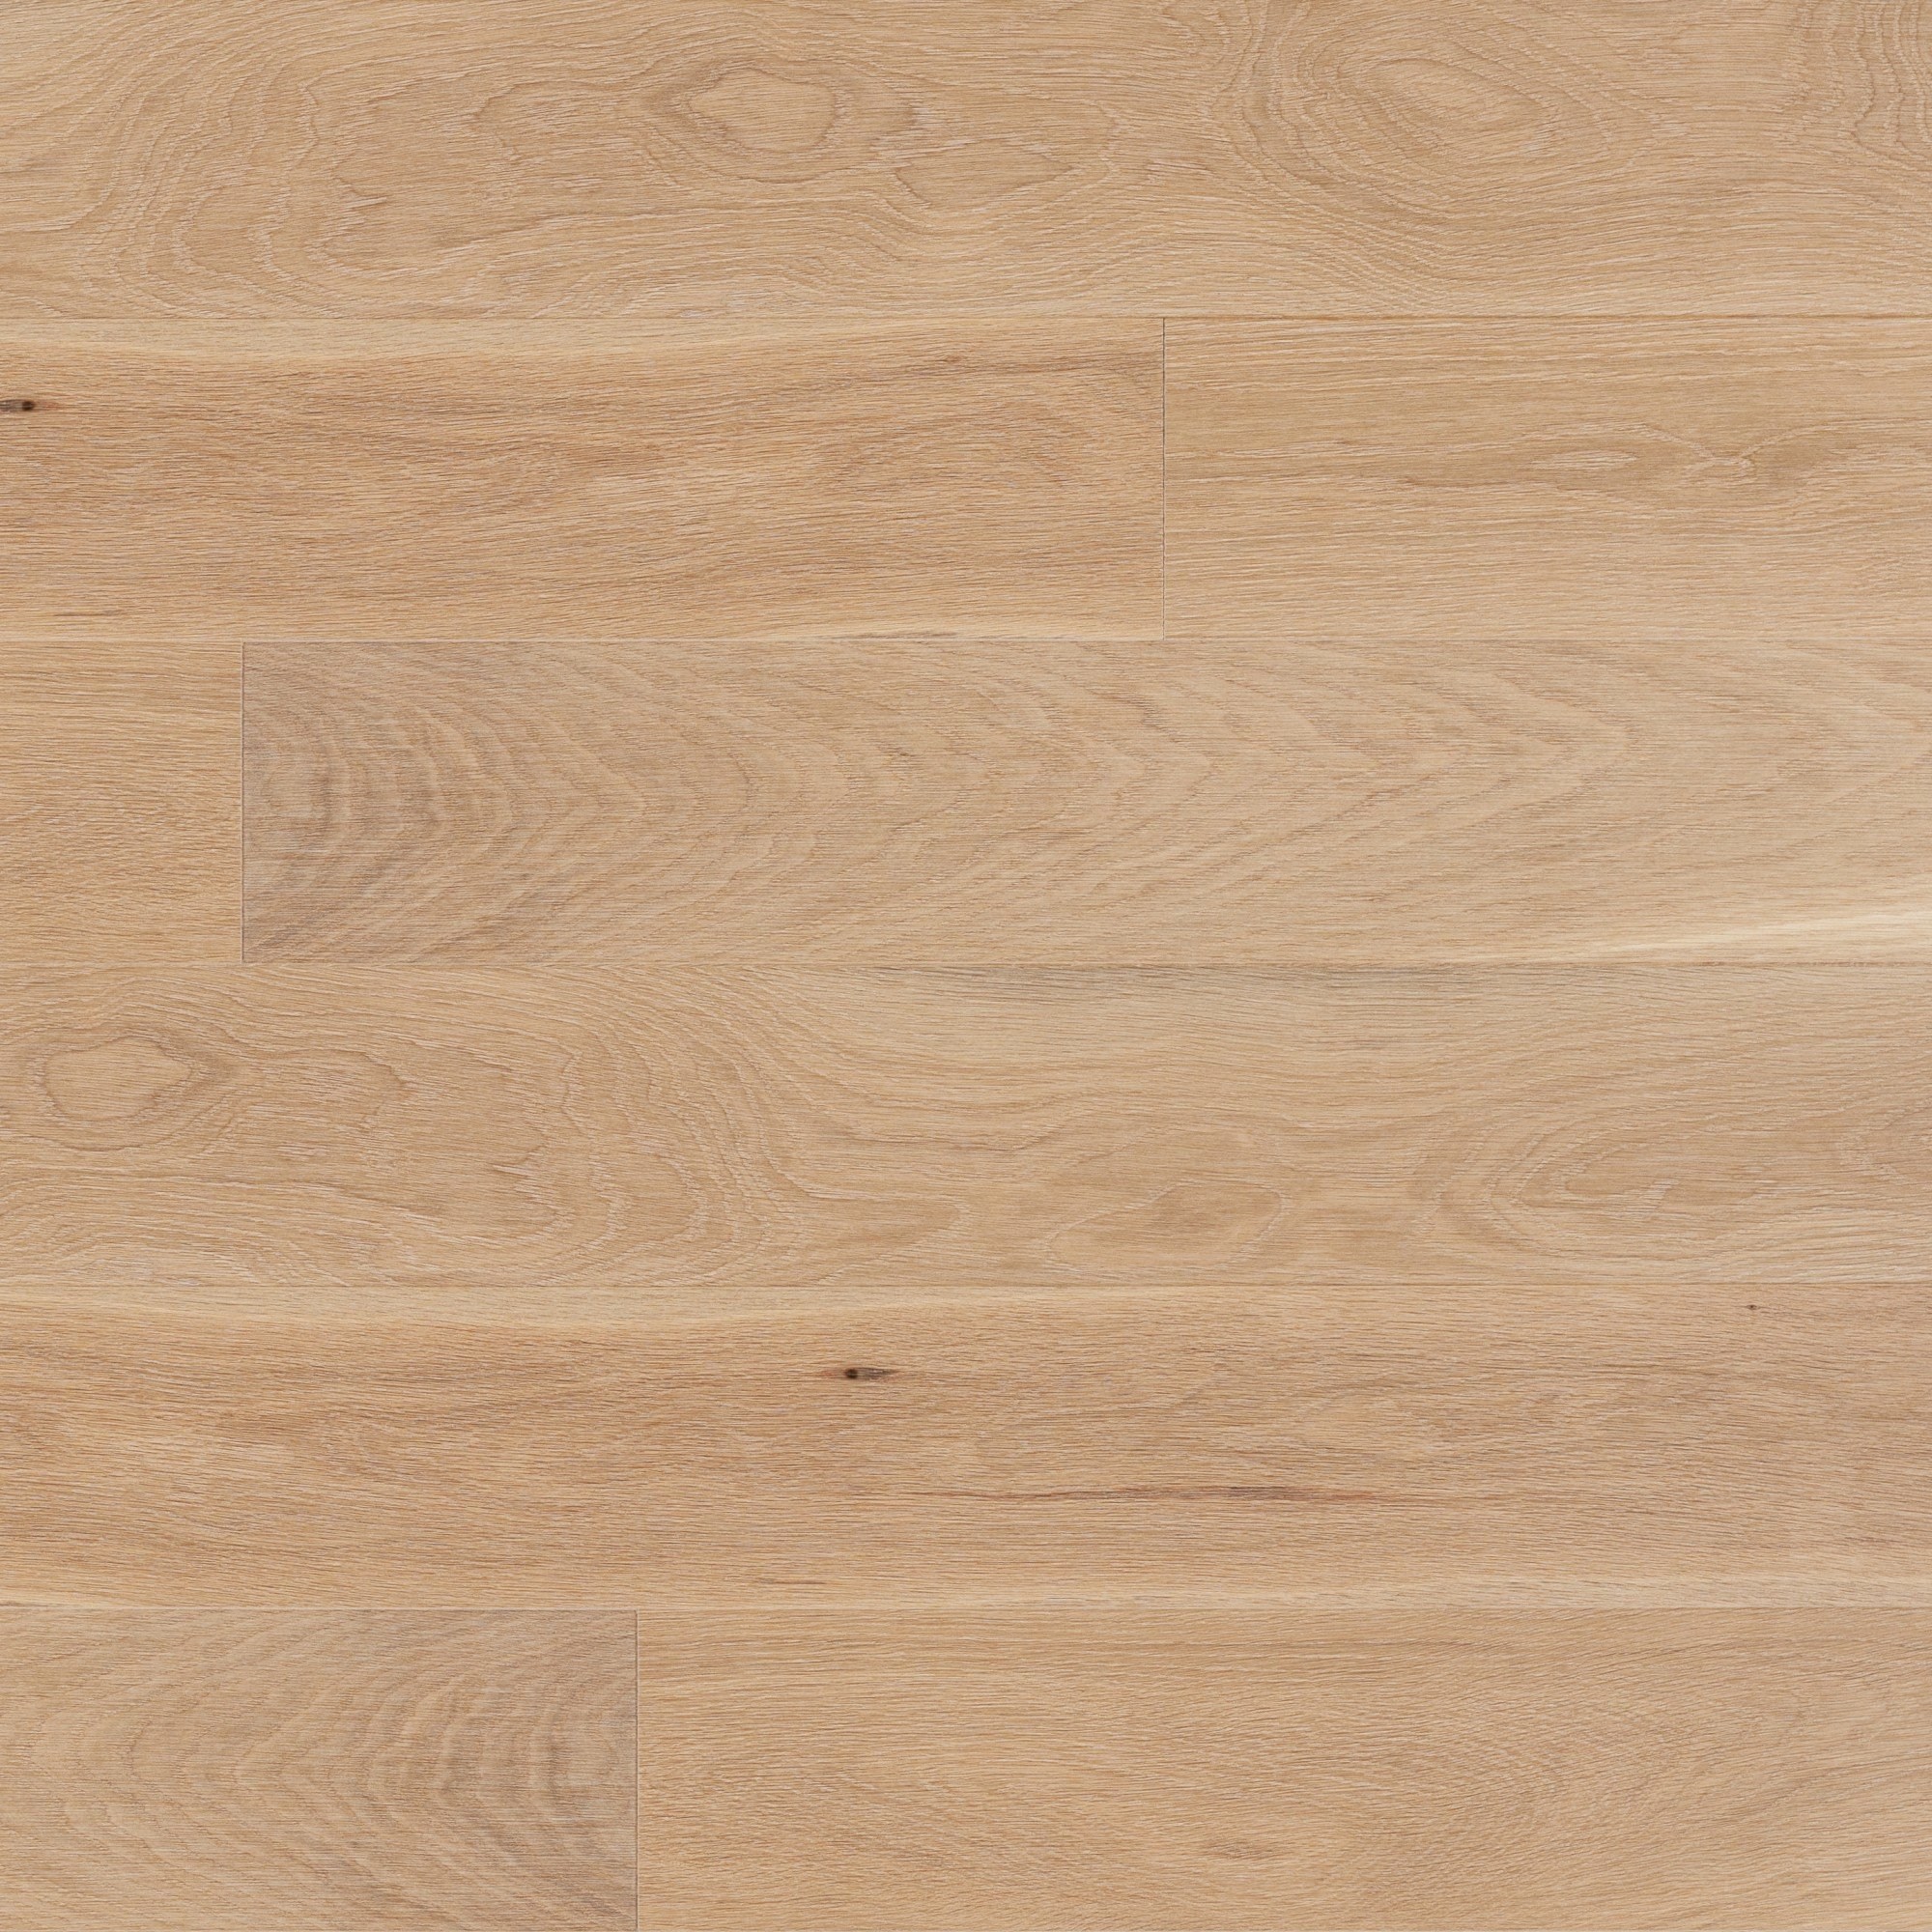 Chêne blanc Isla Exclusive Brossé - Image plancher